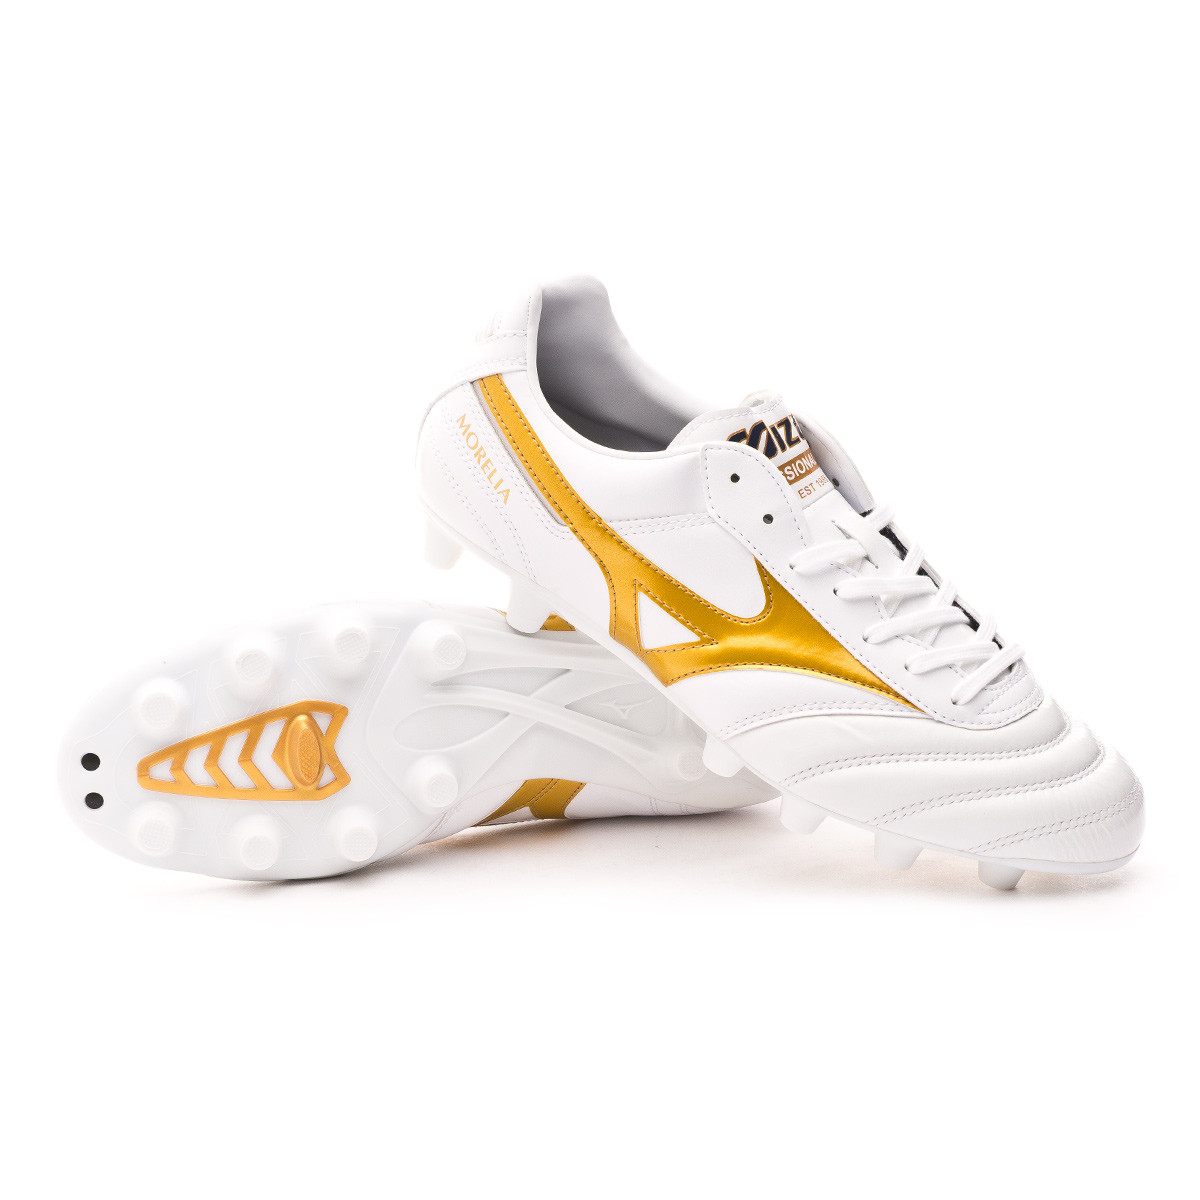 mens mizuno running shoes size 9.5 en espa�ol venta peru